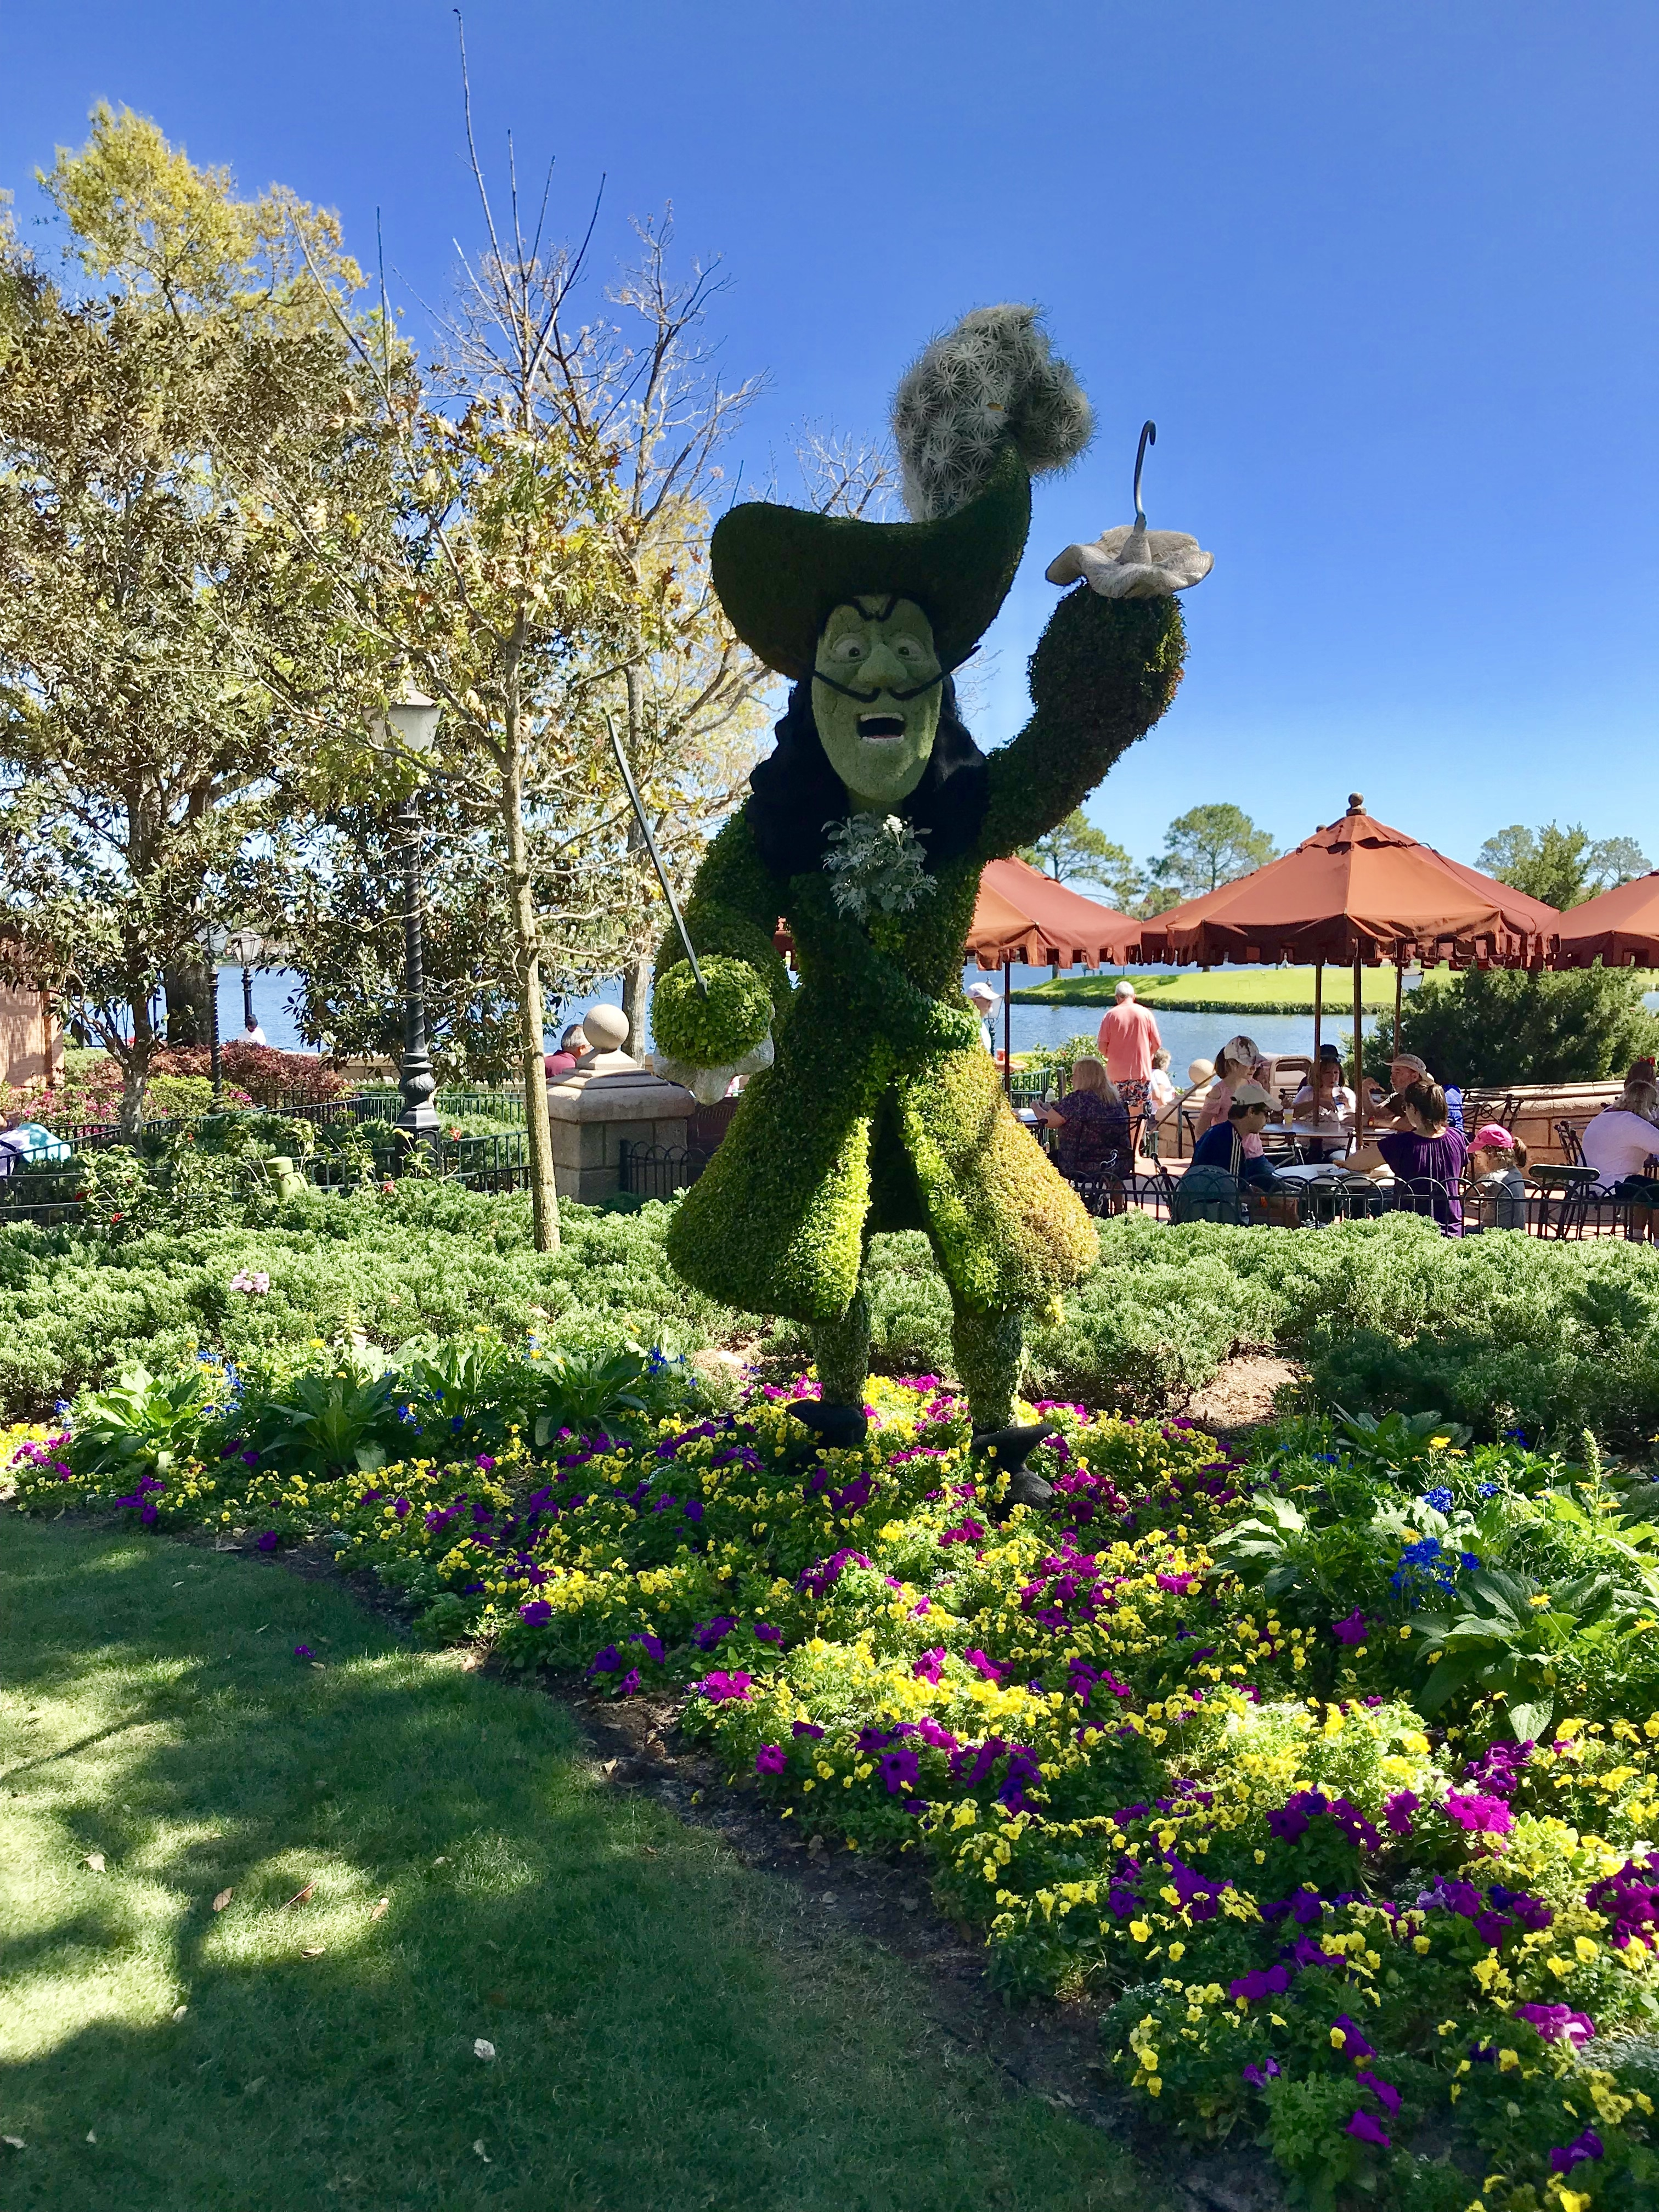 Captain Hook at Disney's Epcot Flower and Garden Festival 2018